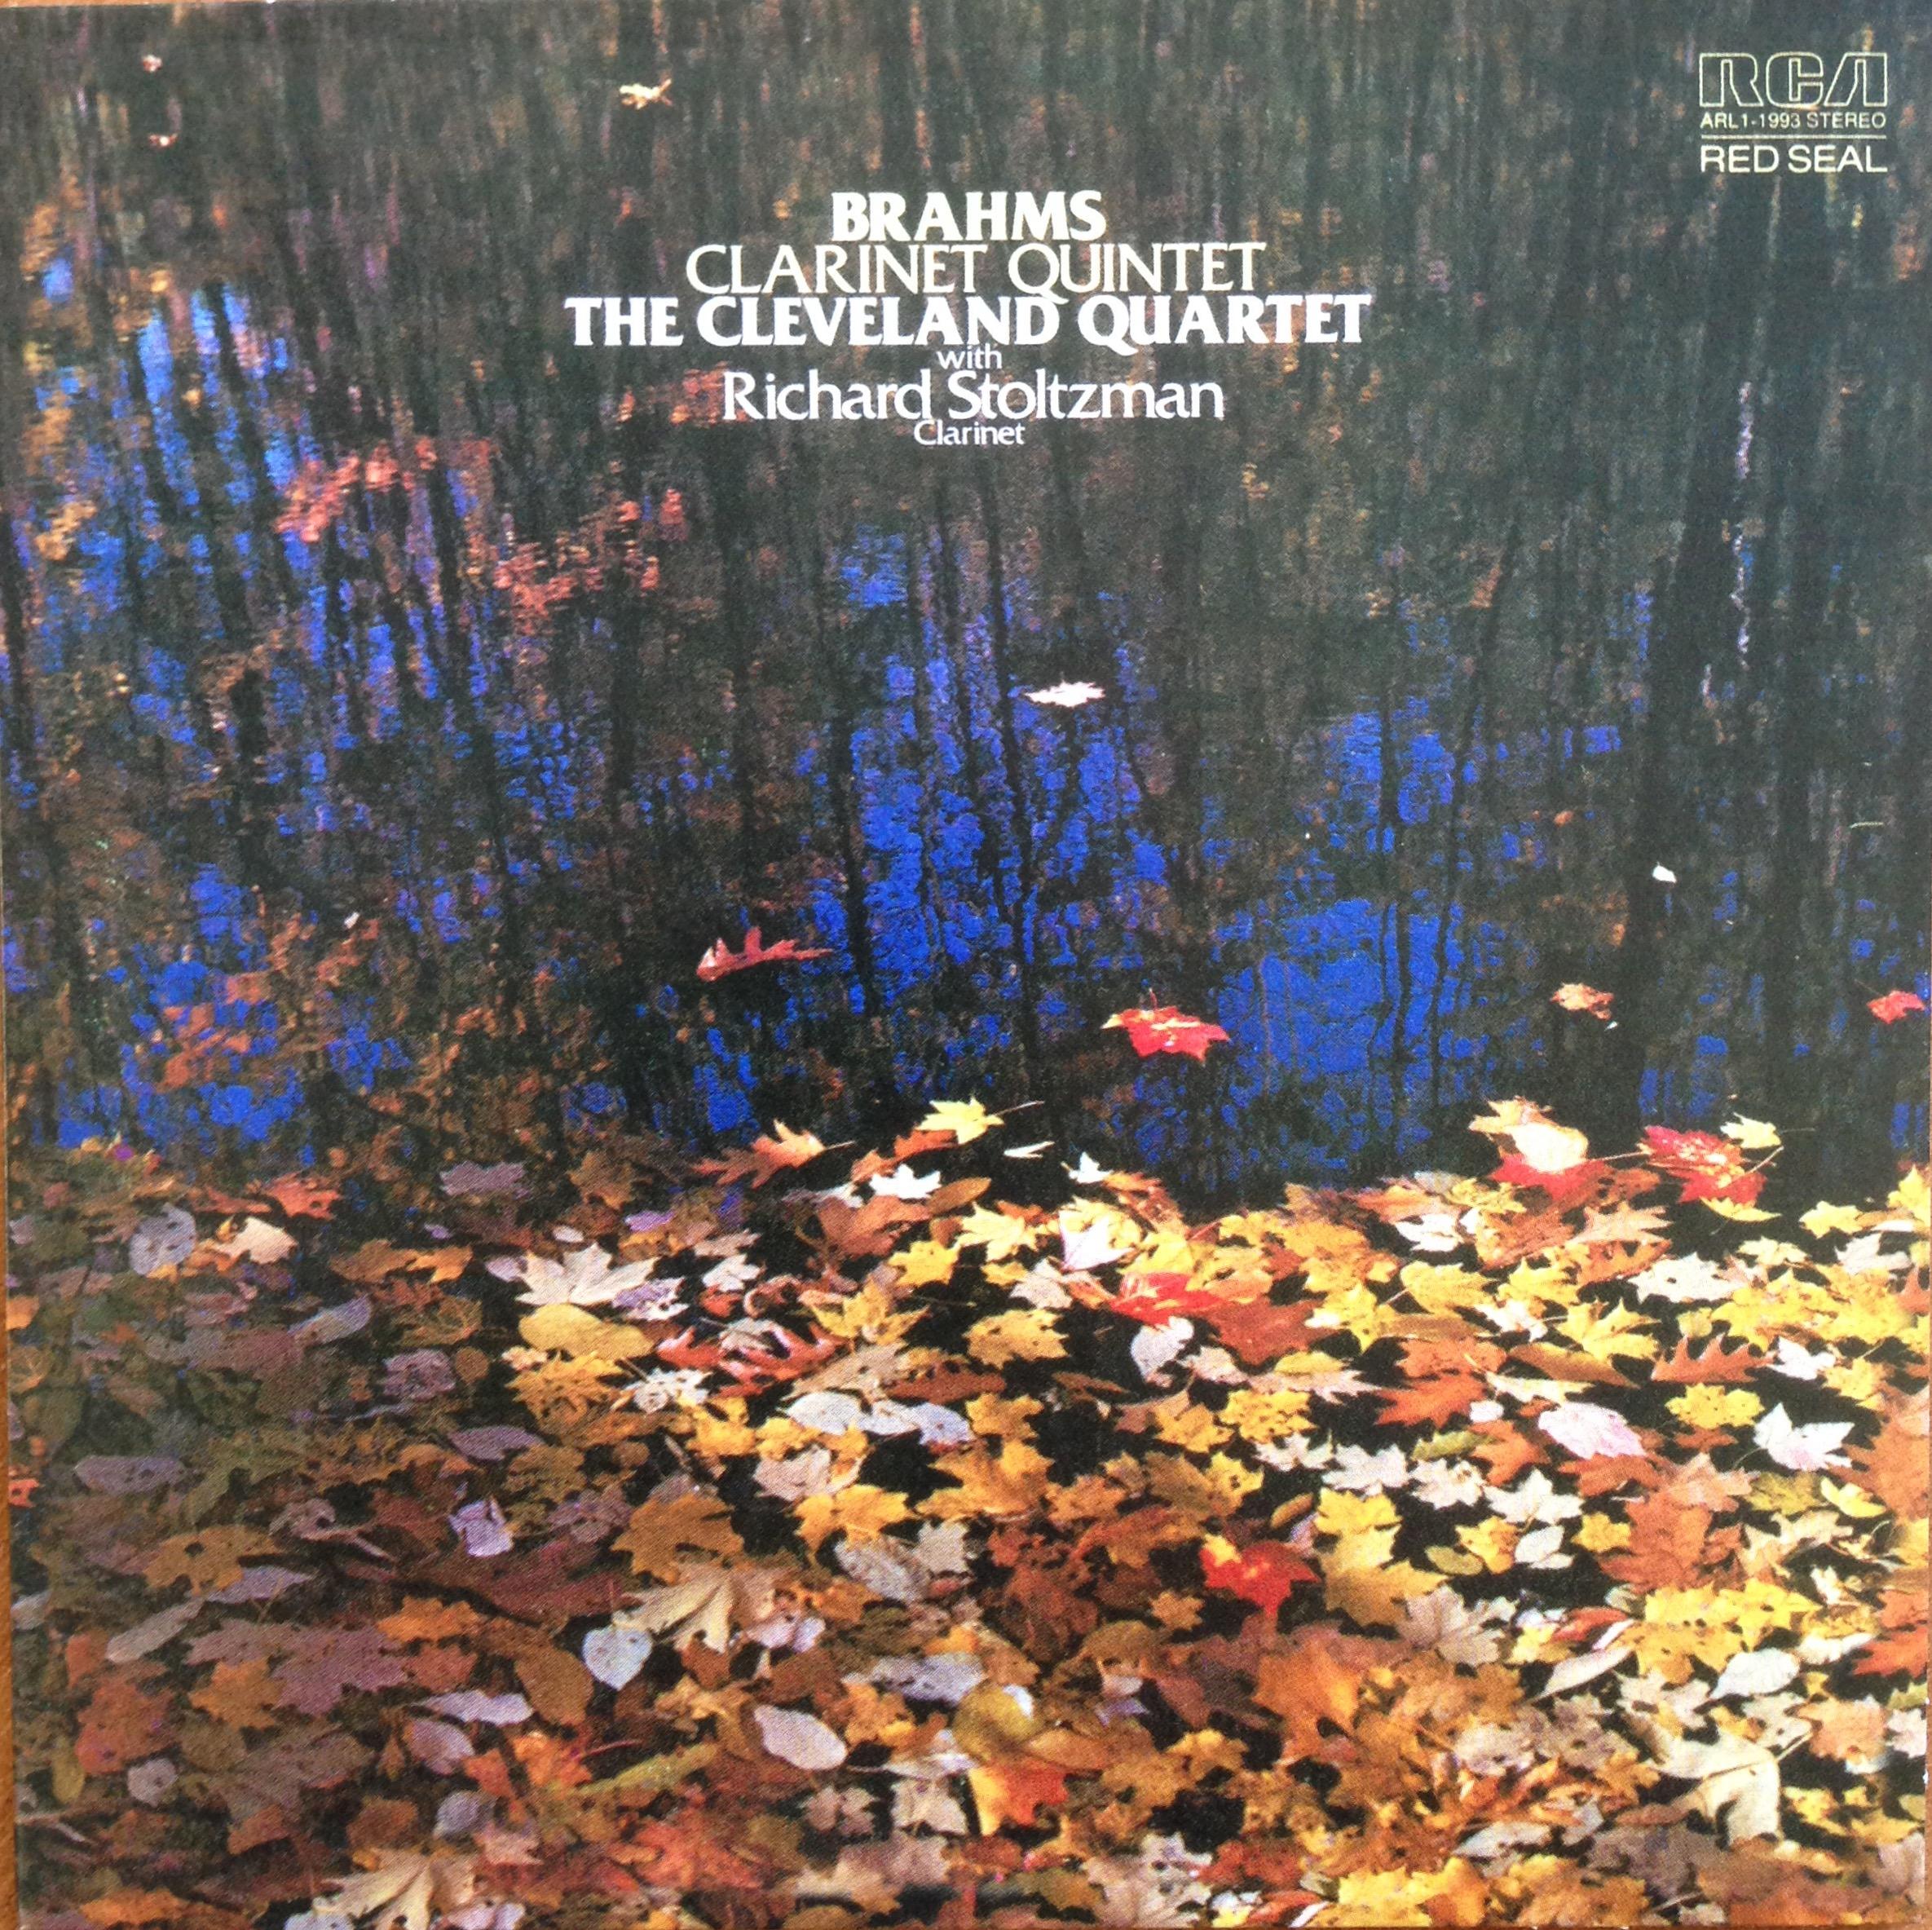 RS CD #2 Brahms Clarinet Quintet